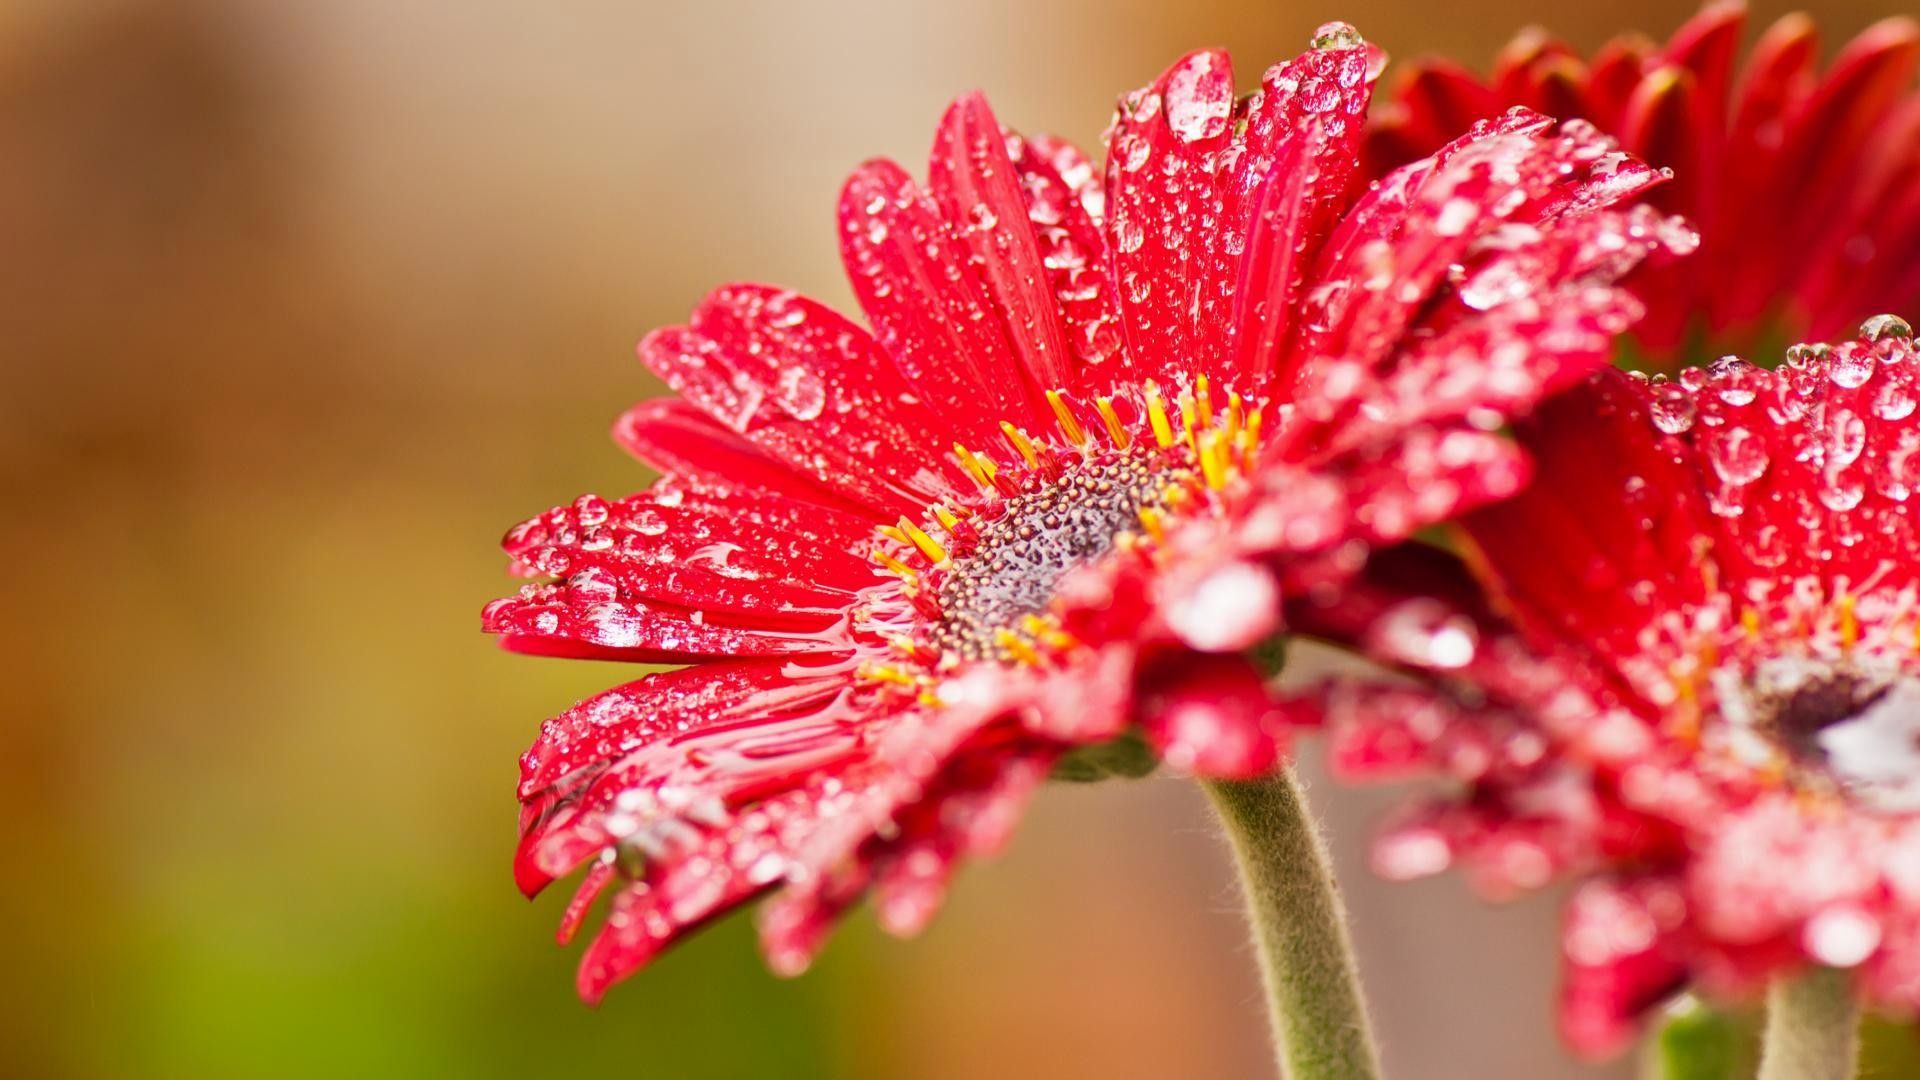 flowers-wallpapers-hd-1080p